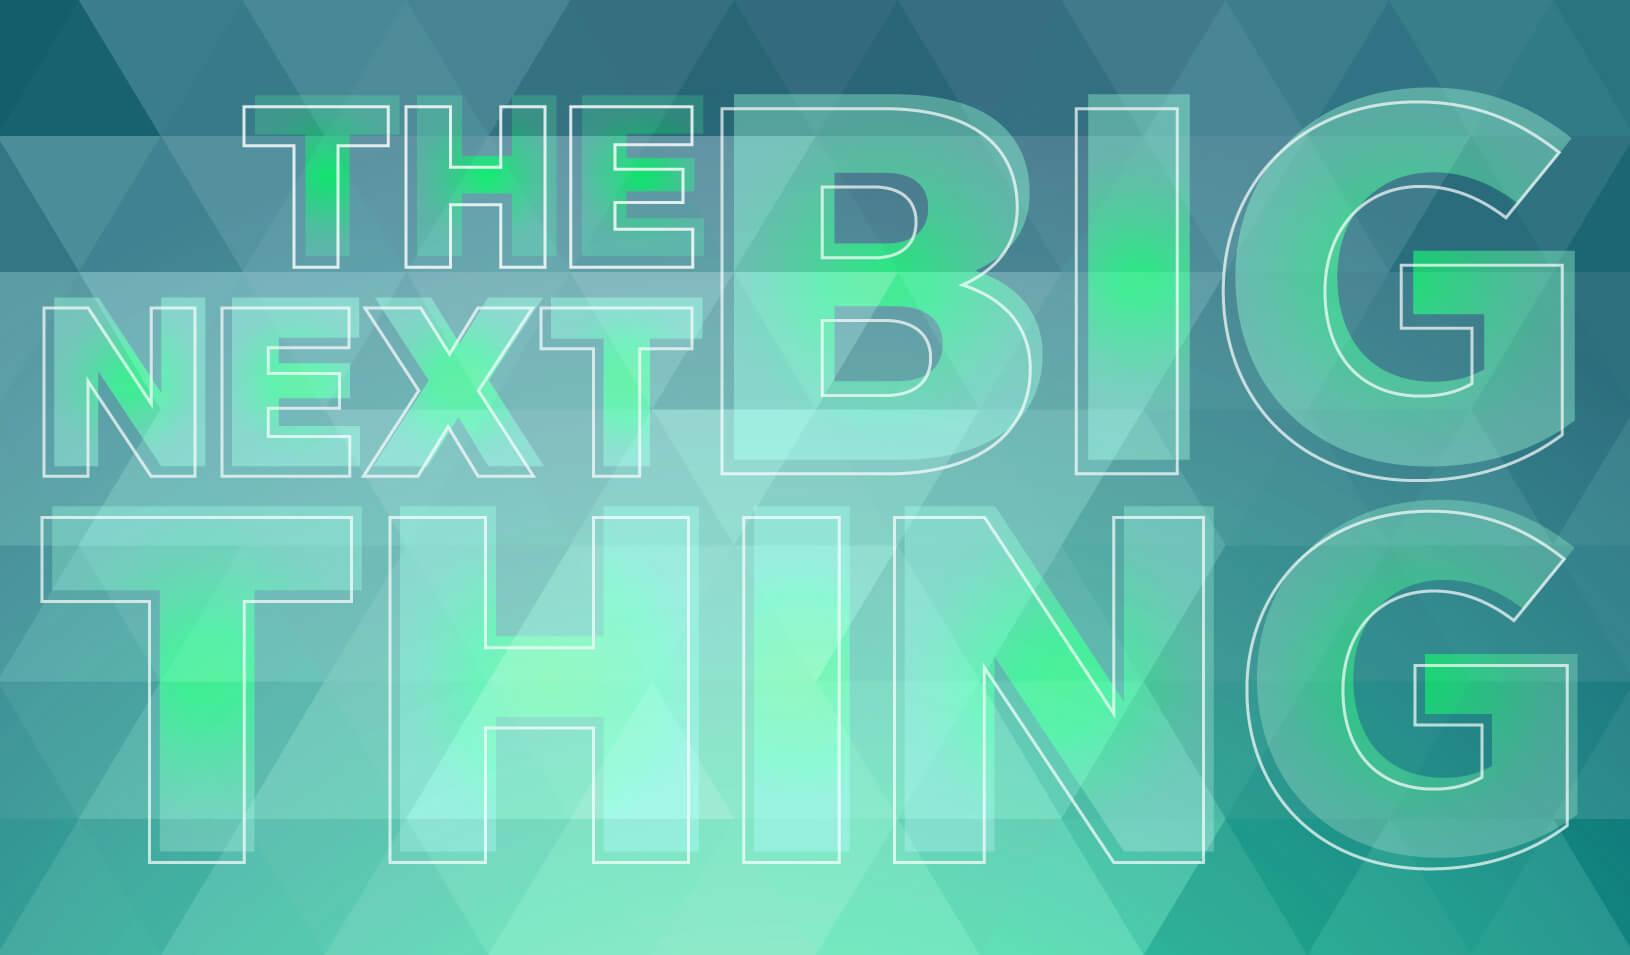 nextbigthing-1630_1